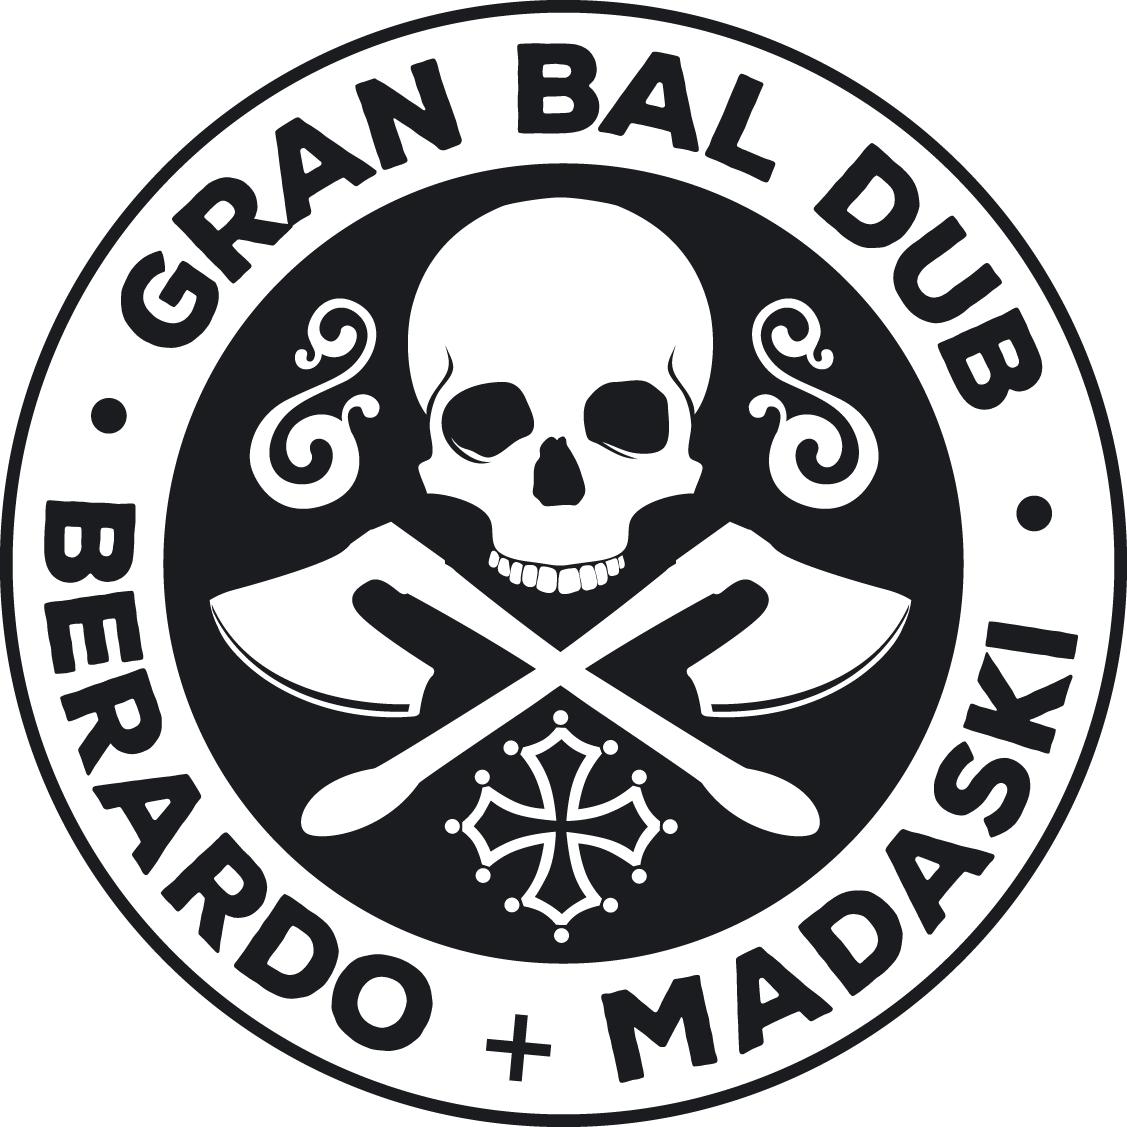 Berardo  Madaski - Gran Bal Dub 4 - fanzine